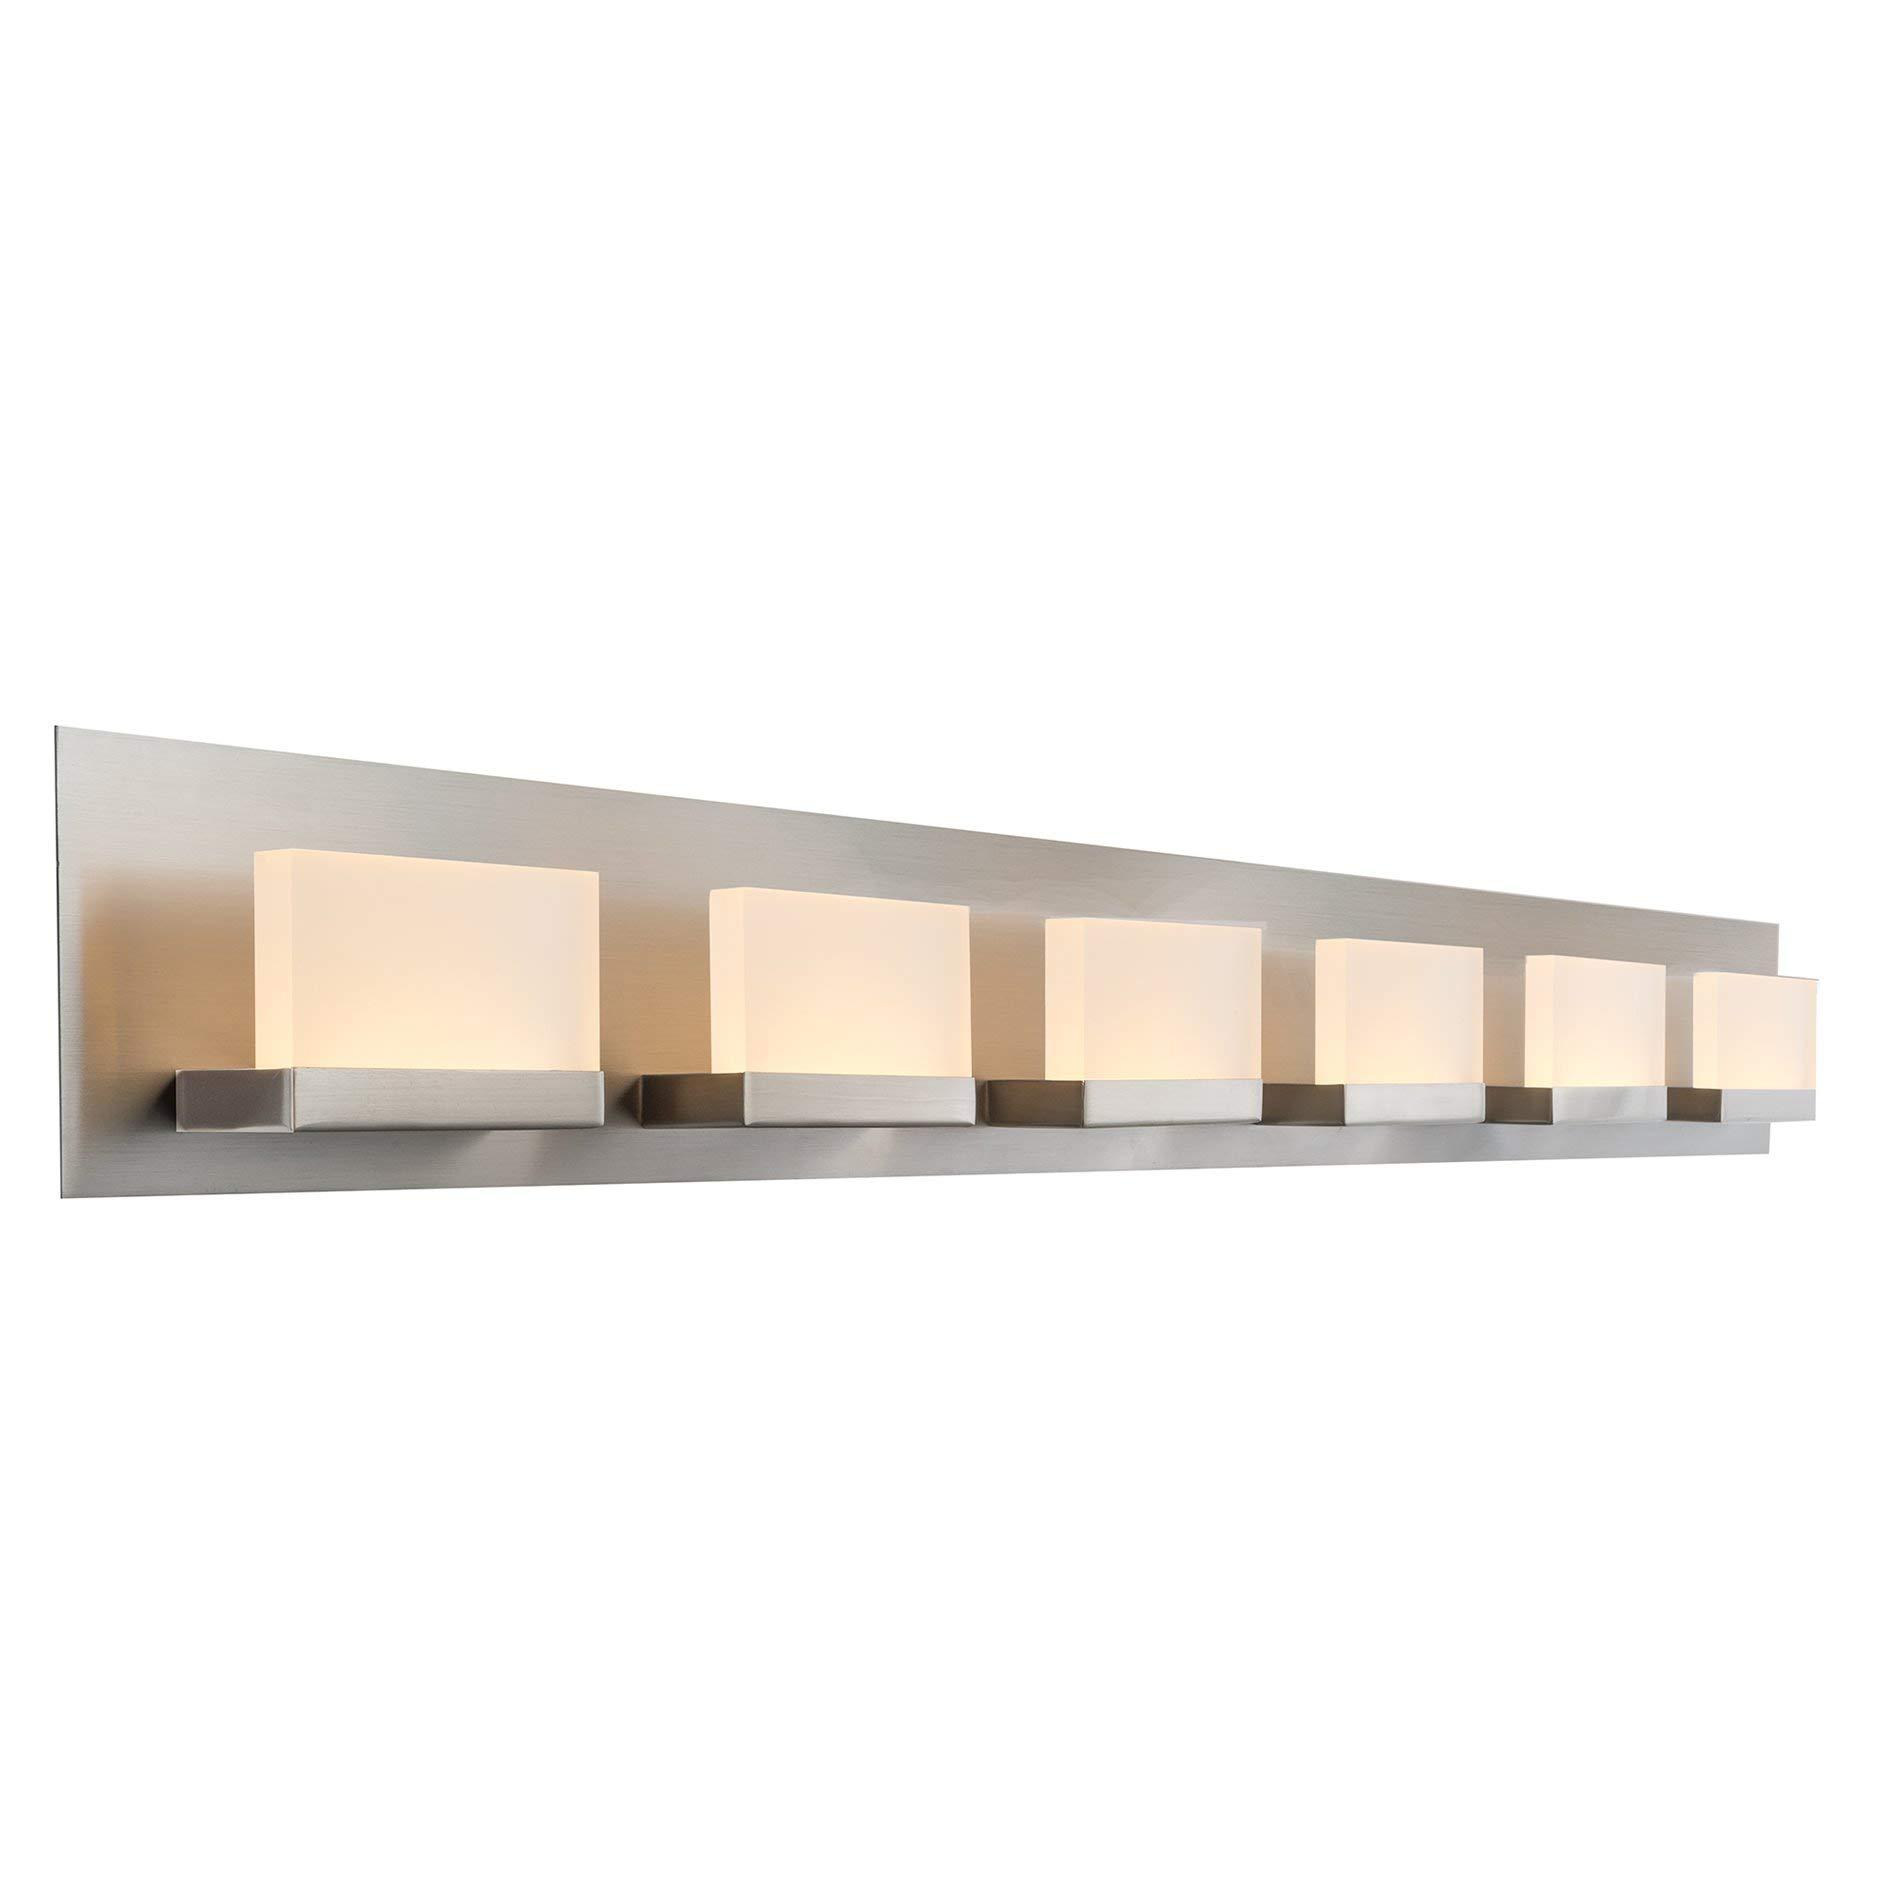 Kira Home Everett 48'' Modern 6-Light 38W Integrated LED (360W eq.) Bathroom/Vanity Light, Rectangular Acrylic Lenses, Energy Efficient, Eco-Friendly, 3000k Warm White Light, Brushed Nickel Finish